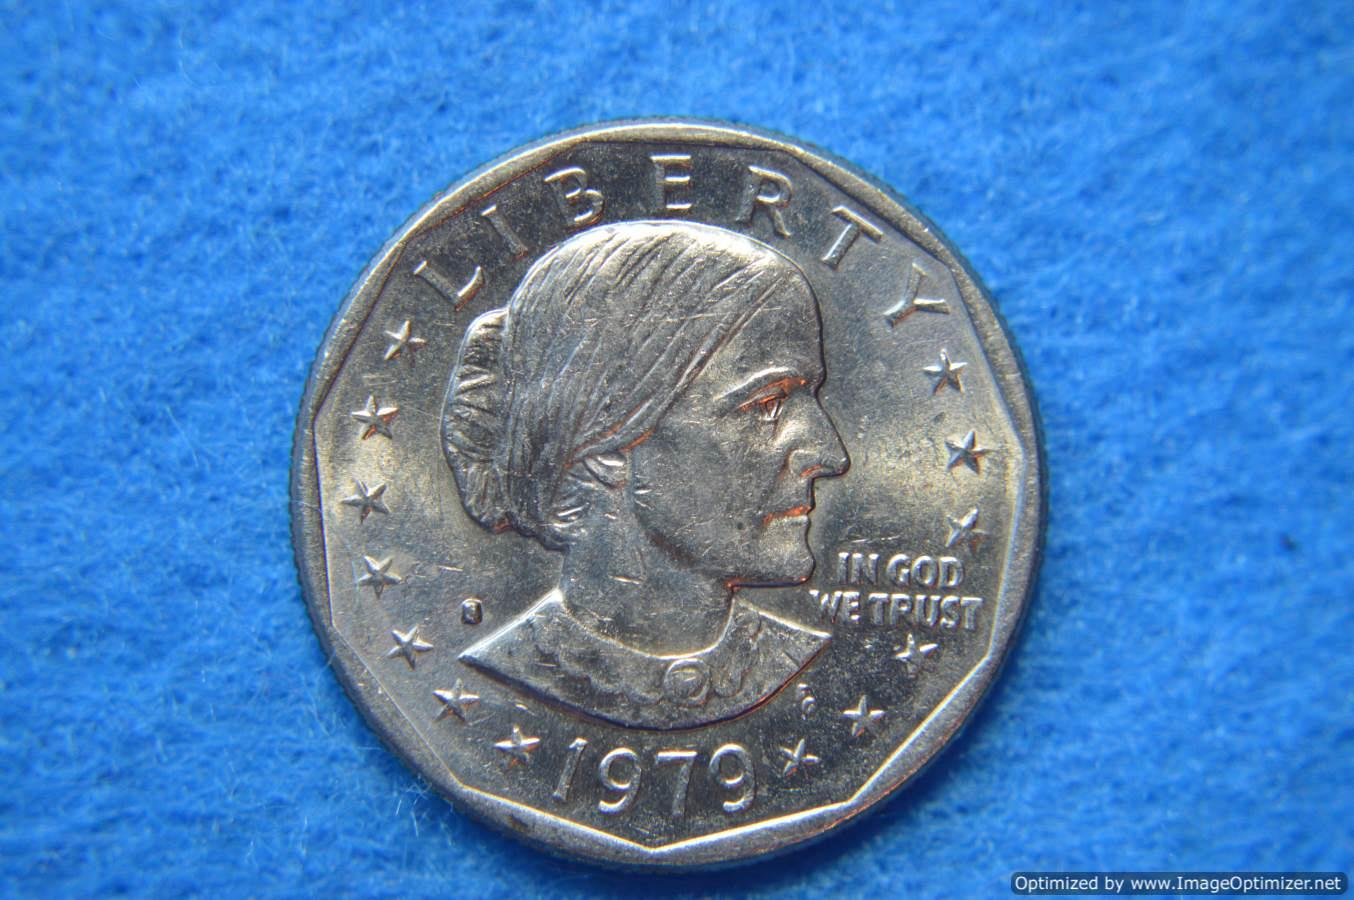 S Susan B Anthony Dollars Filled S